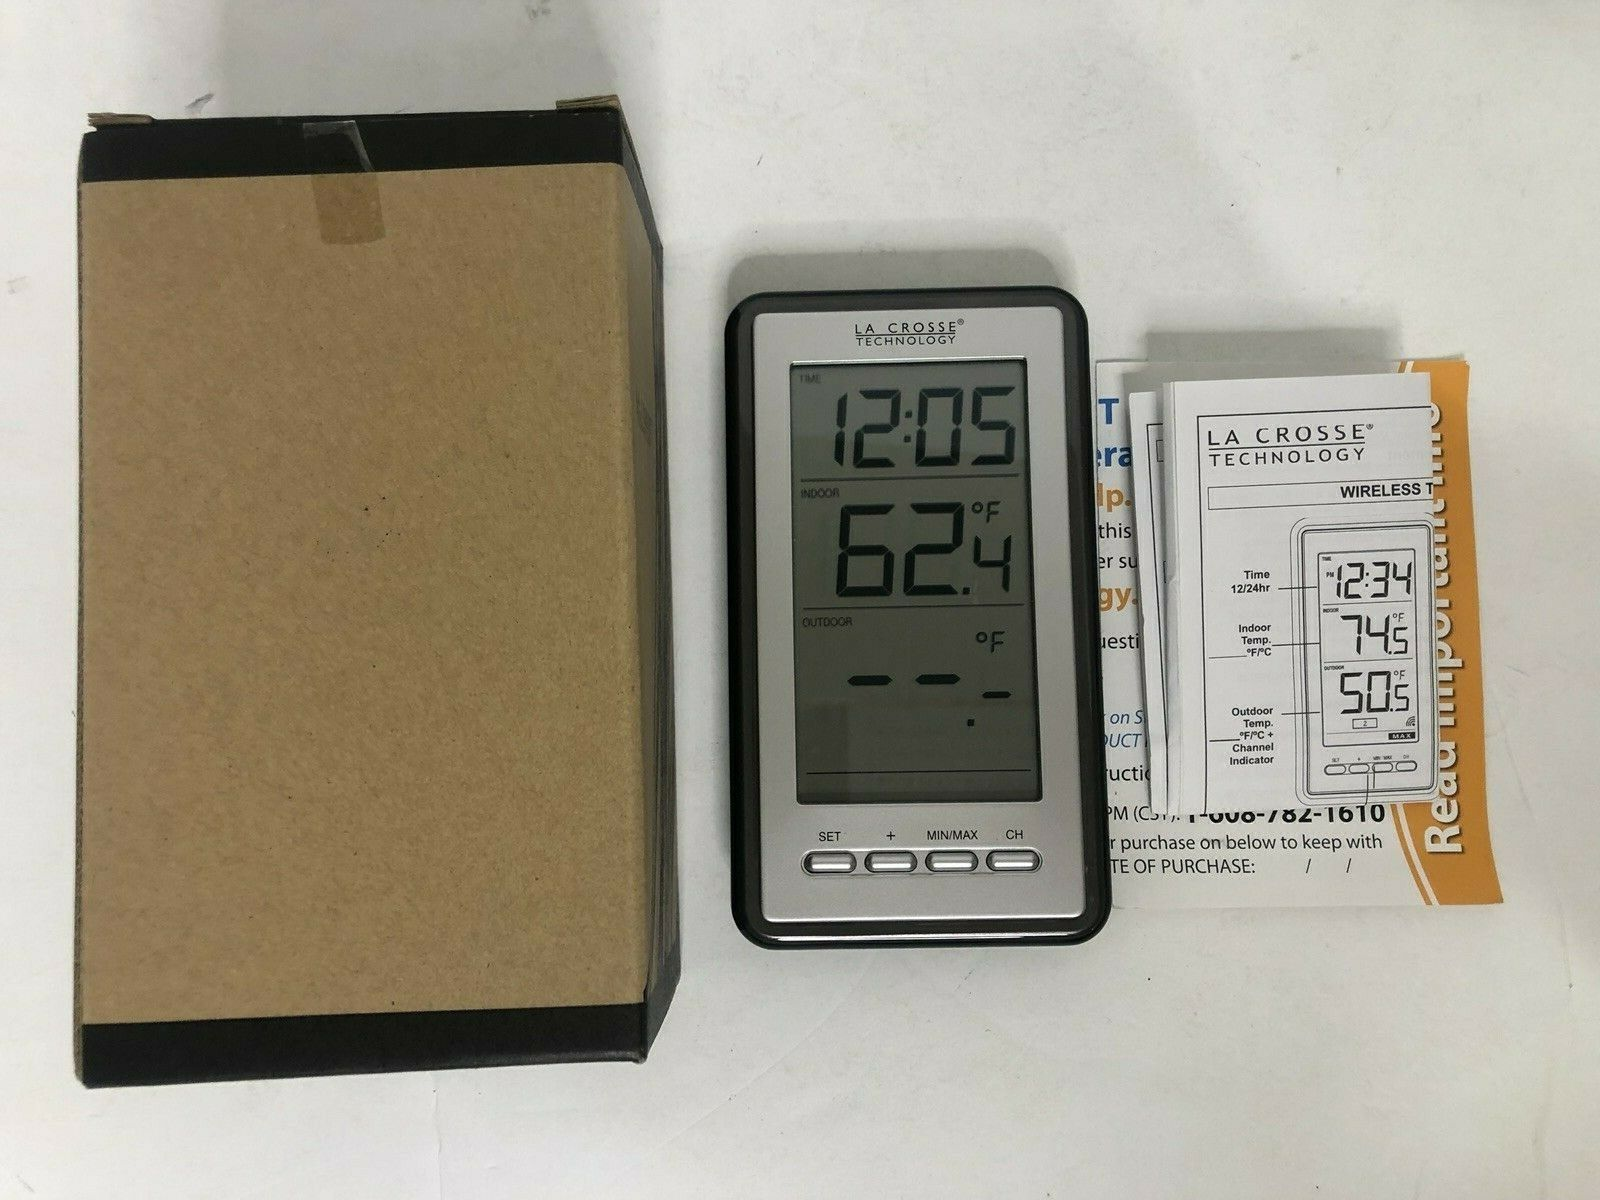 La Crosse Technology Digital Wireless Thermometer + Time, WS-916OU-IT NO SENSER